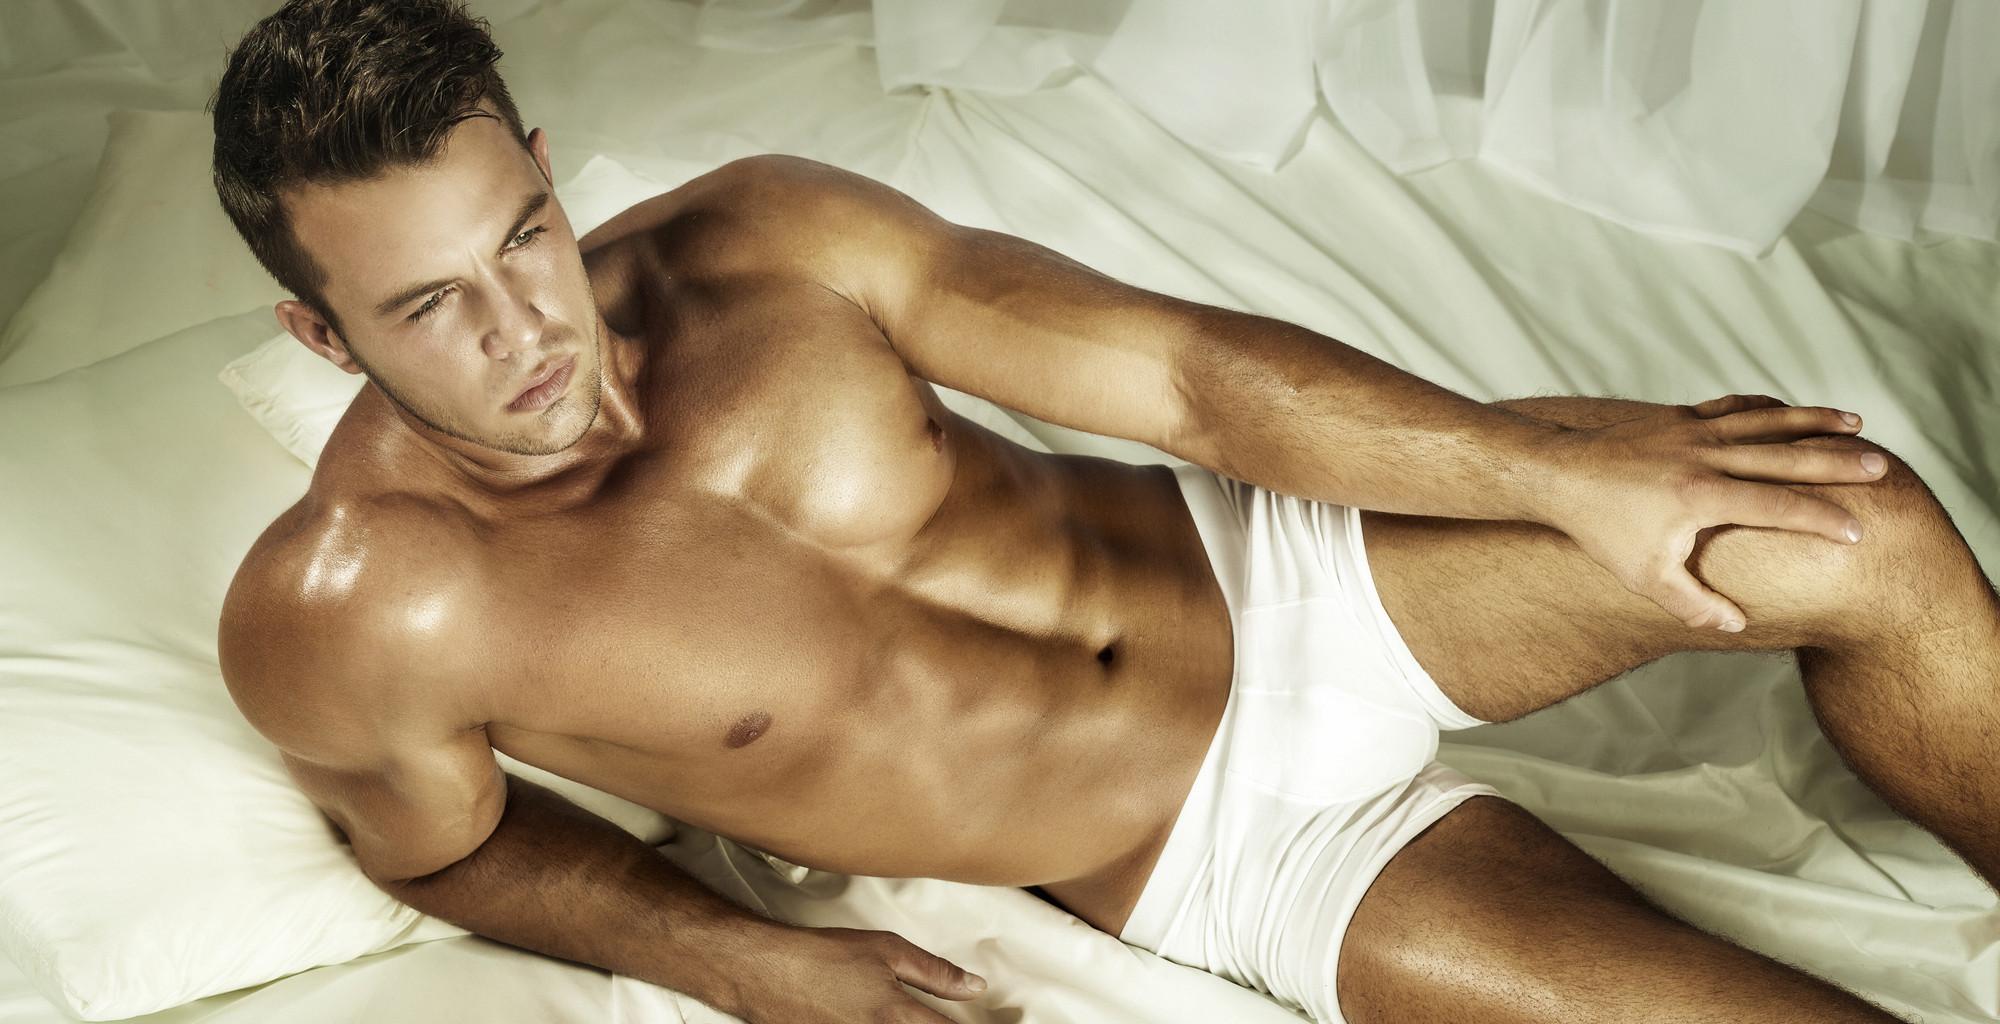 Eroticky masaz gay